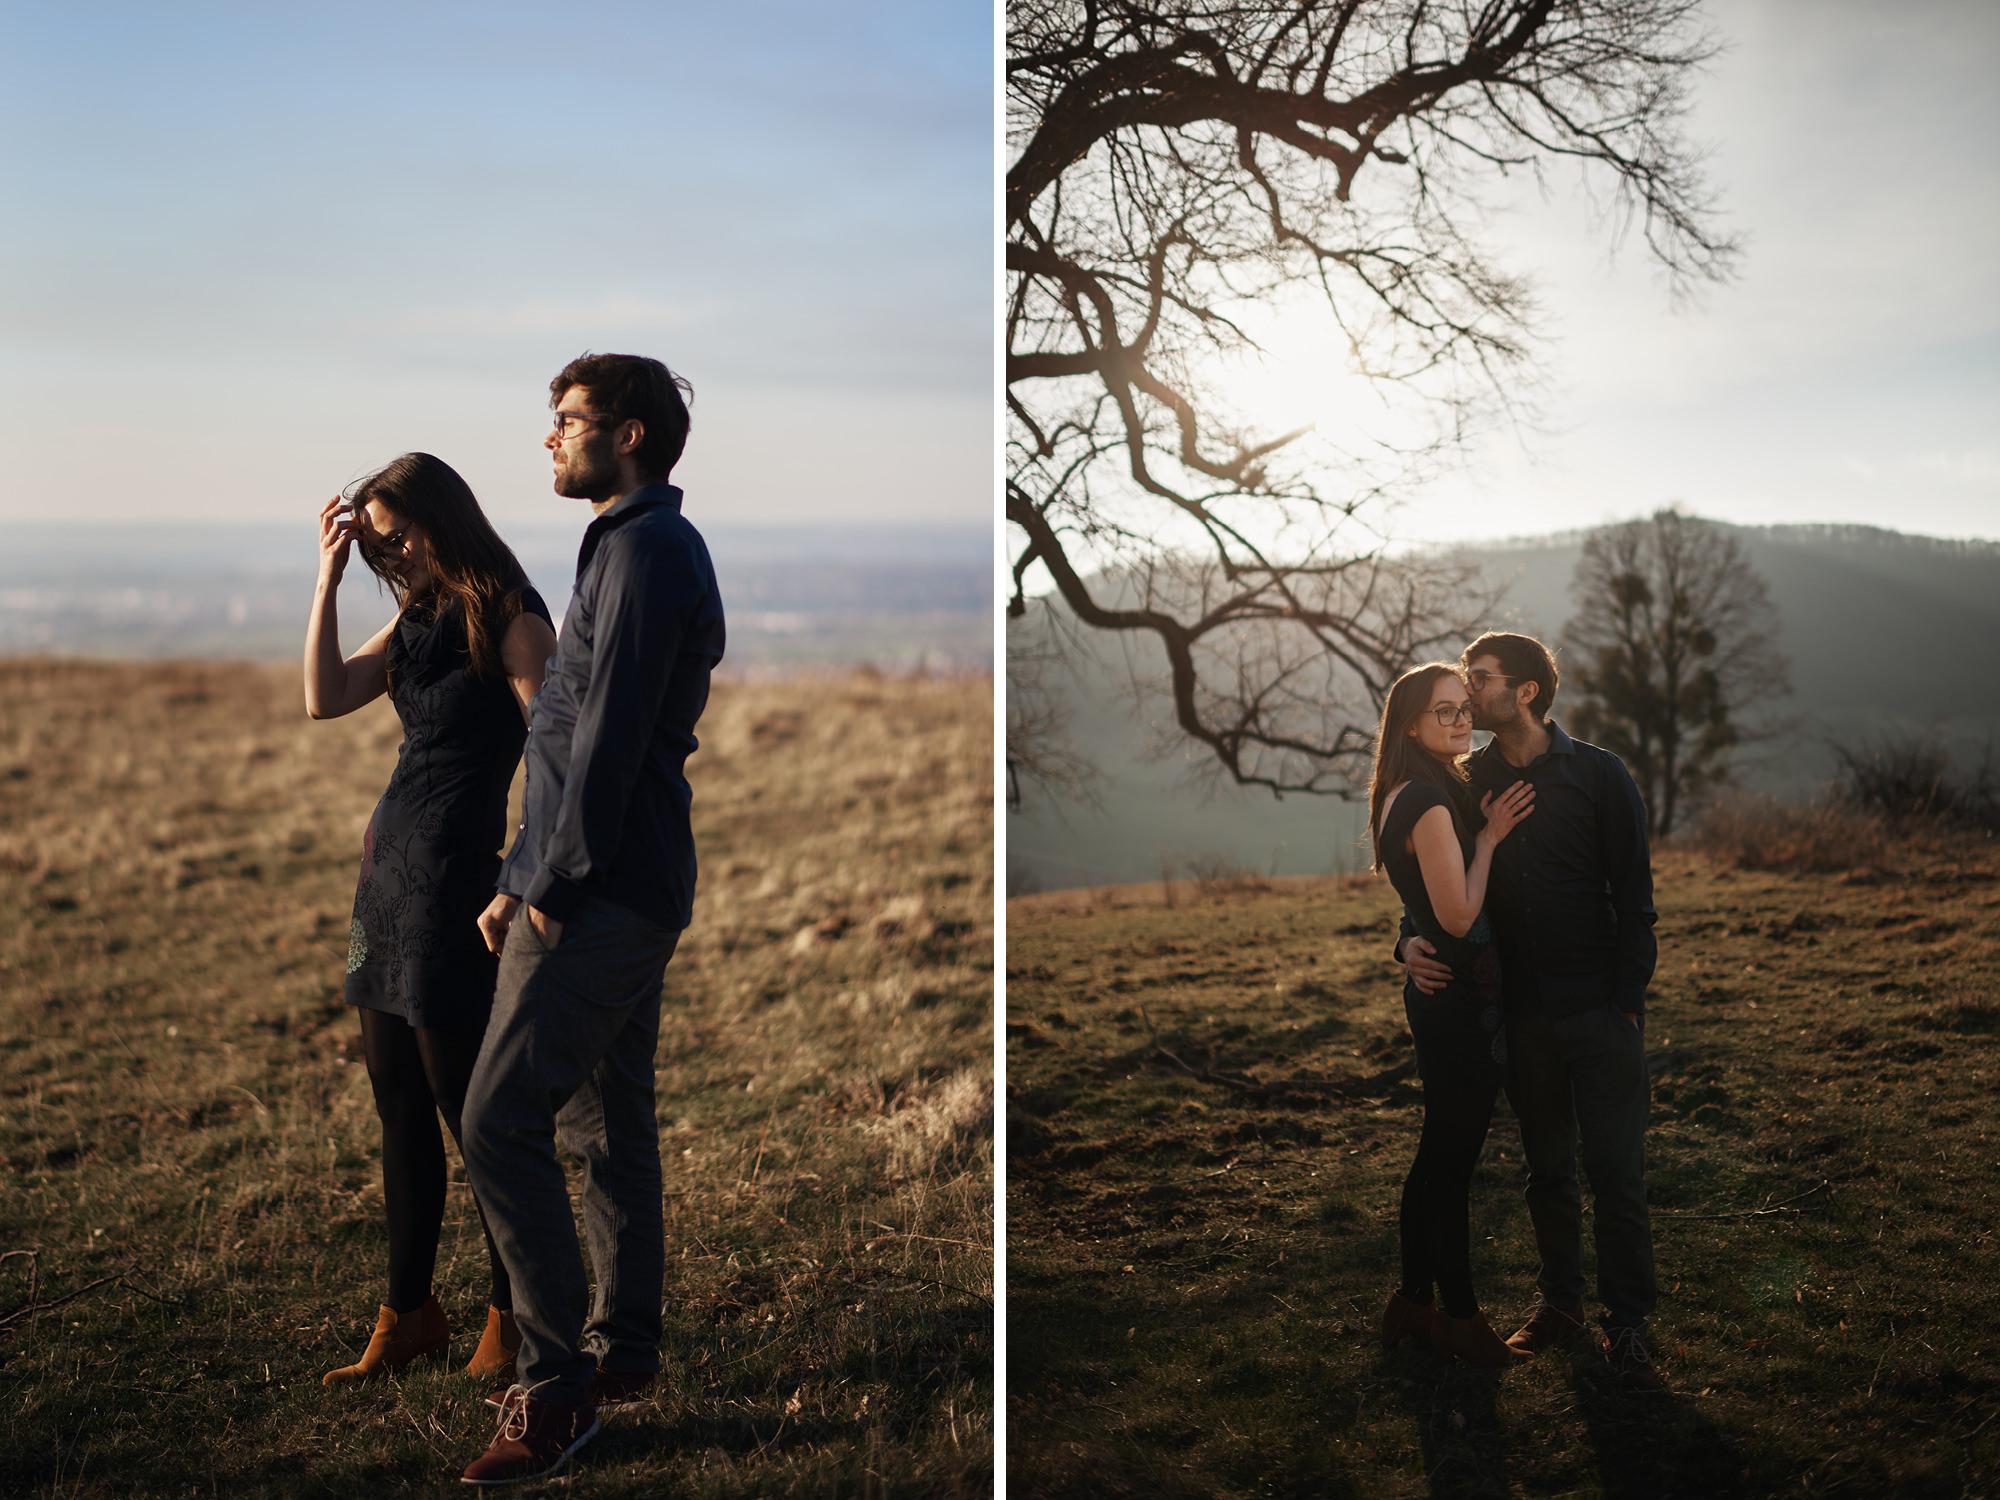 Paarbilder Frühling Kirchheim Teck Hochzeitsfotograf Martin Spoerl Photography 0002